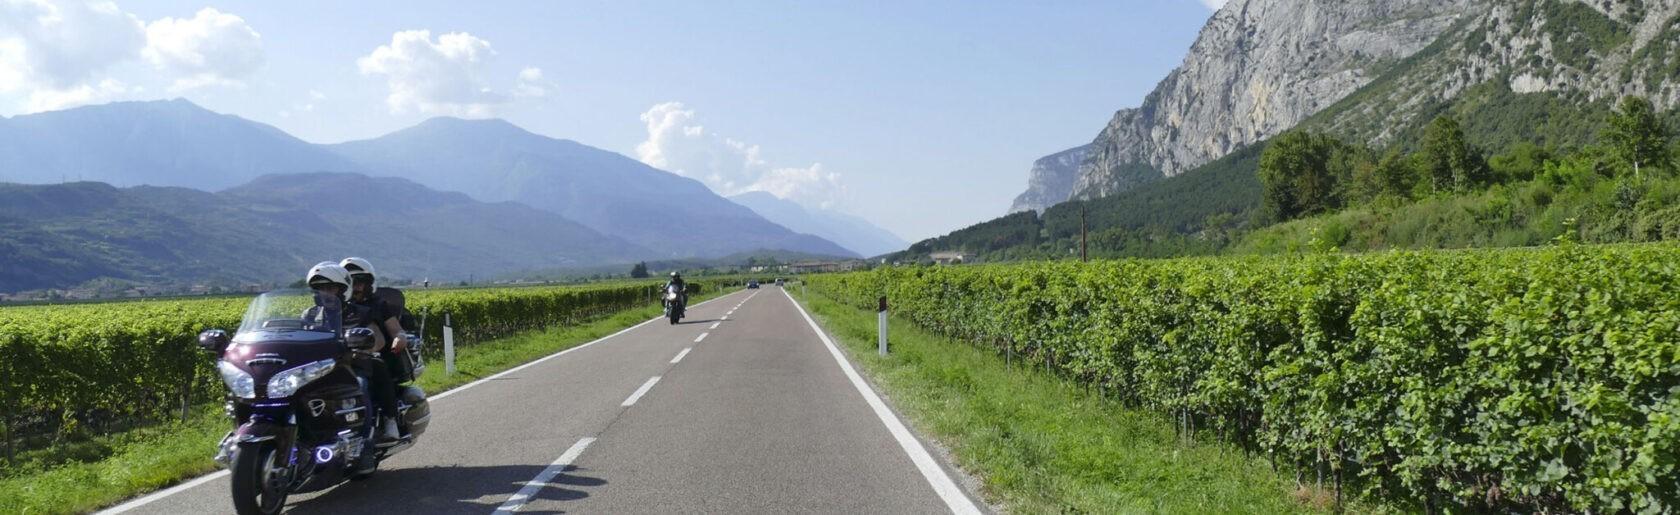 Tour in moto in Trentino Alto Adige